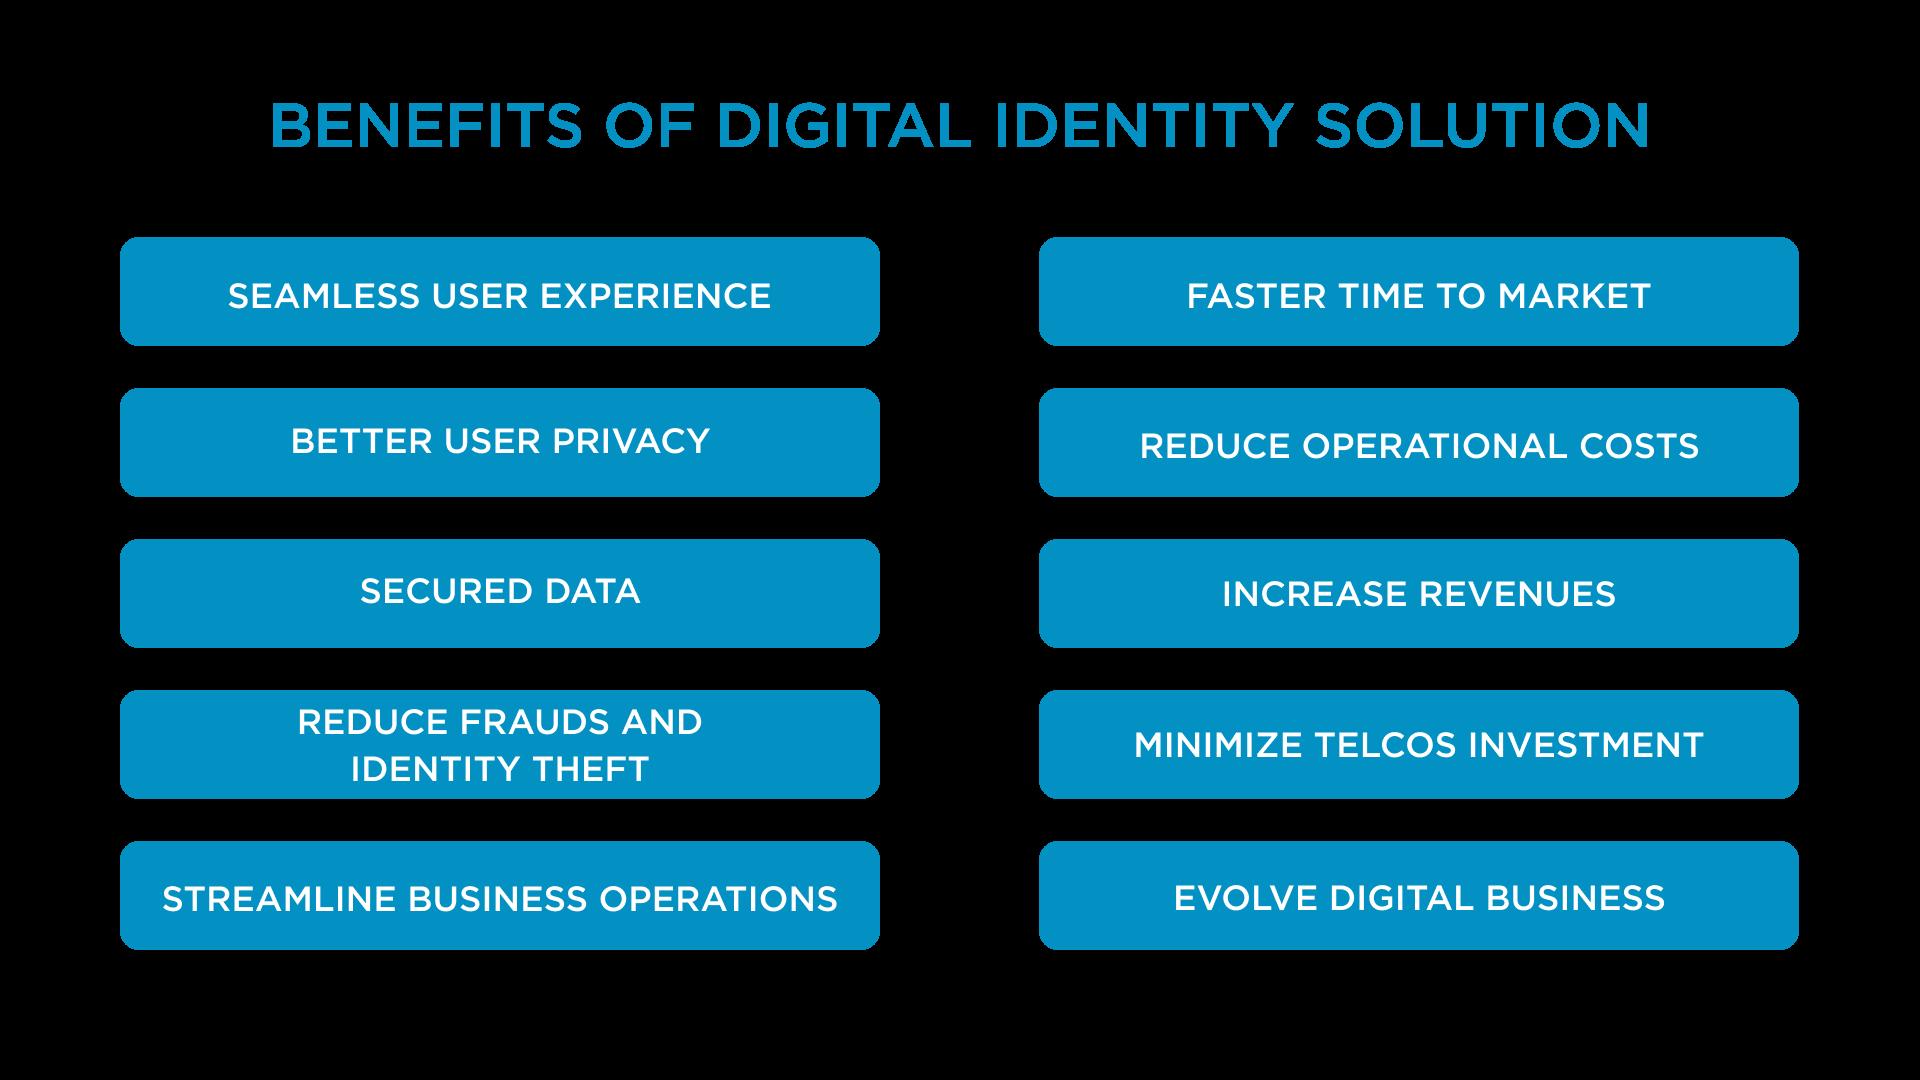 Benefits of digital identity